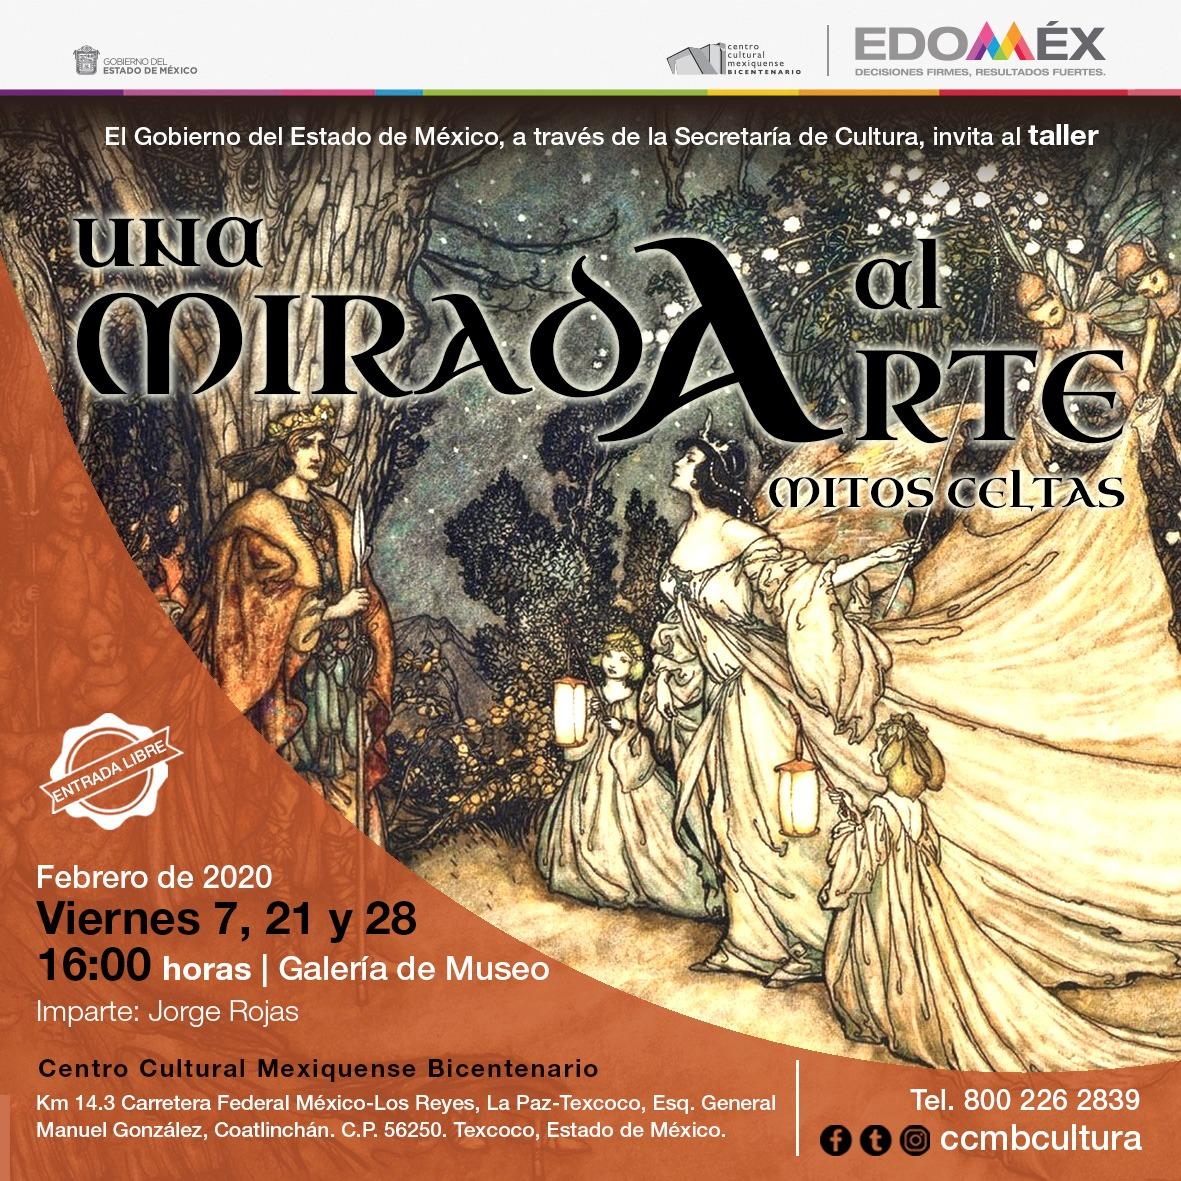 Imparten talleres de mitología griega, celta y nórdica en centro Cultural Mexiquense Bicentenario